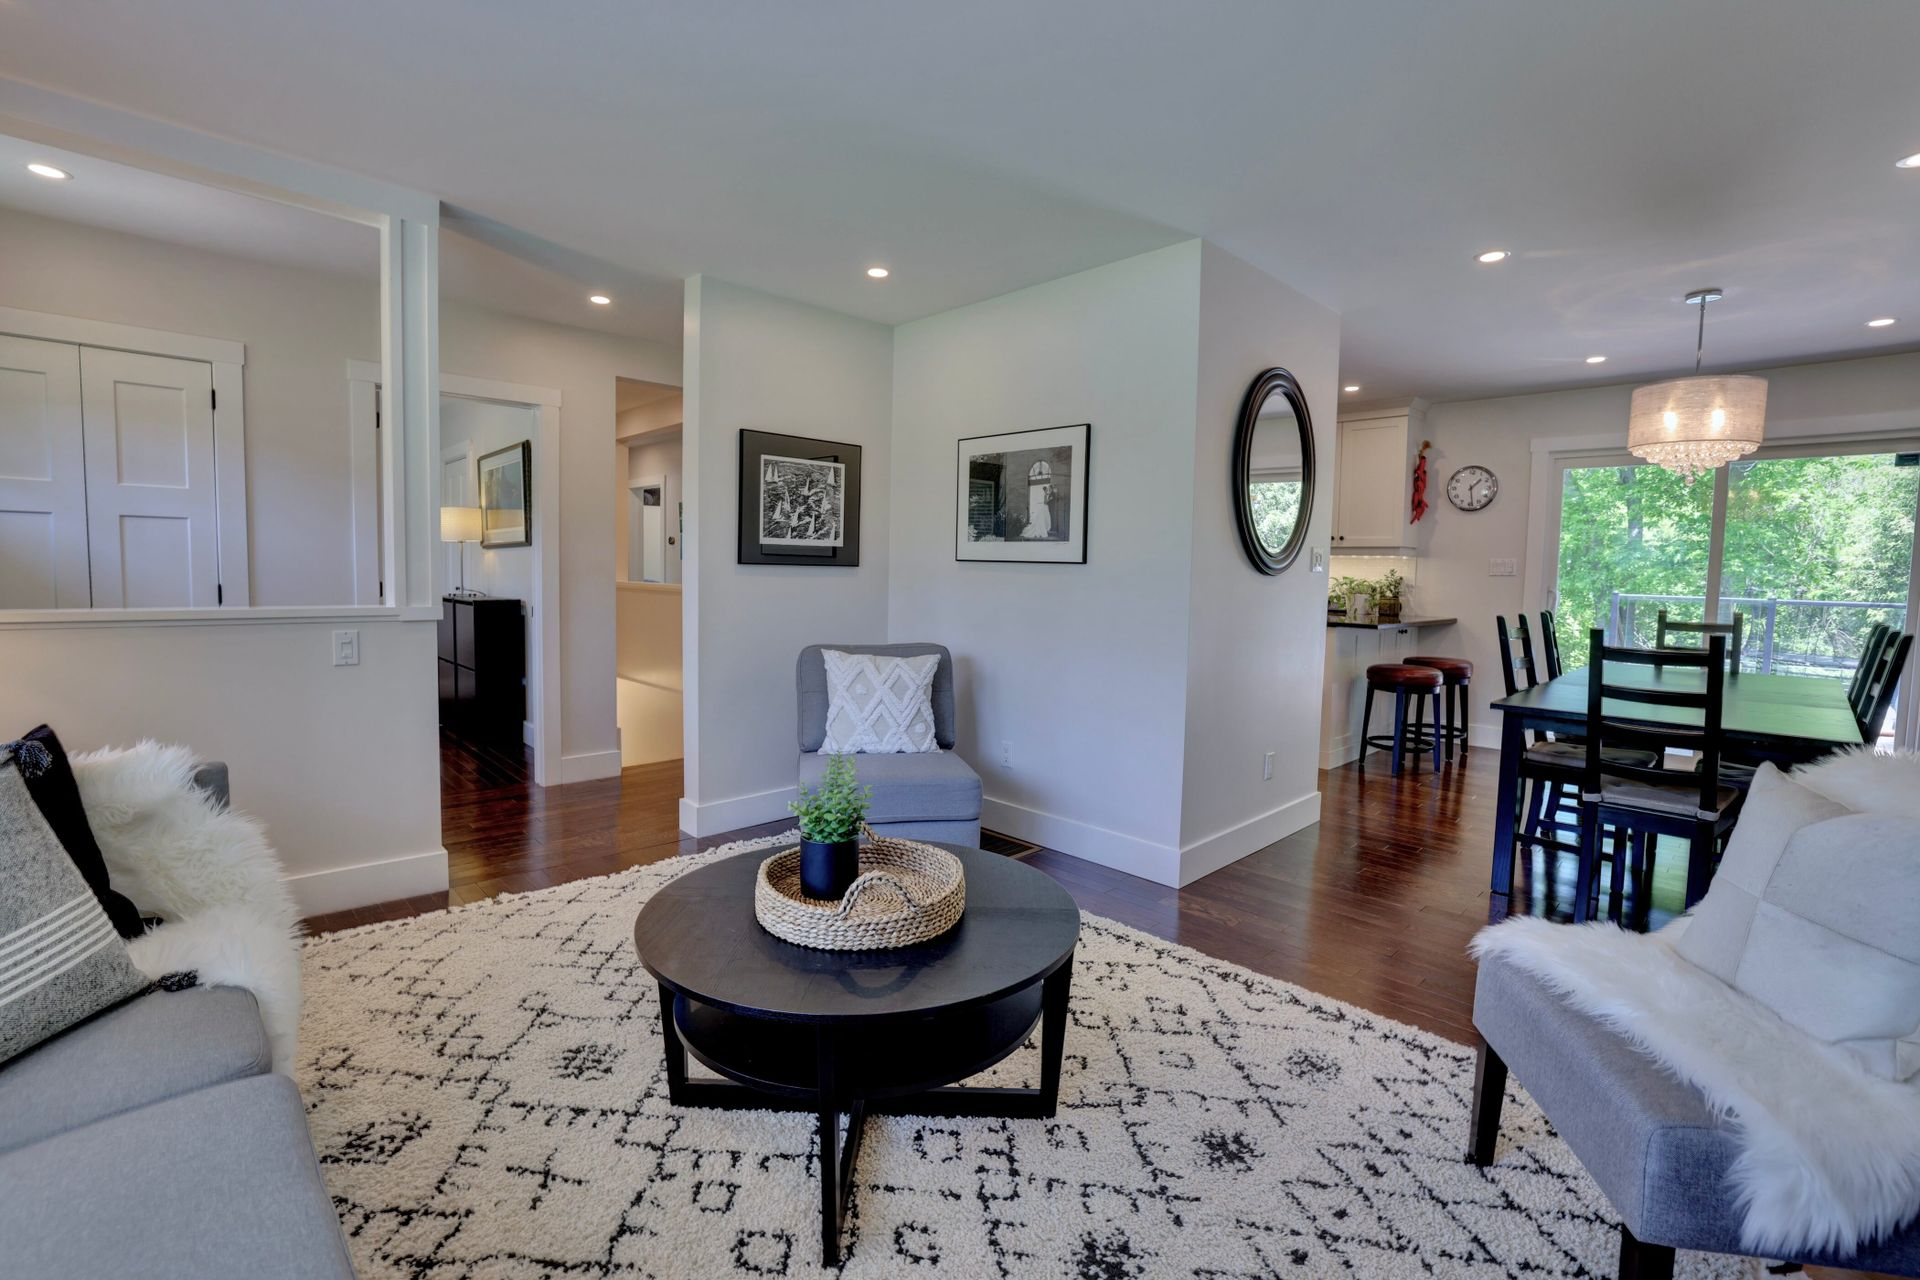 249-lakeview-ave-burlington-living-room at 249 Lakeview Ave, Burlington,